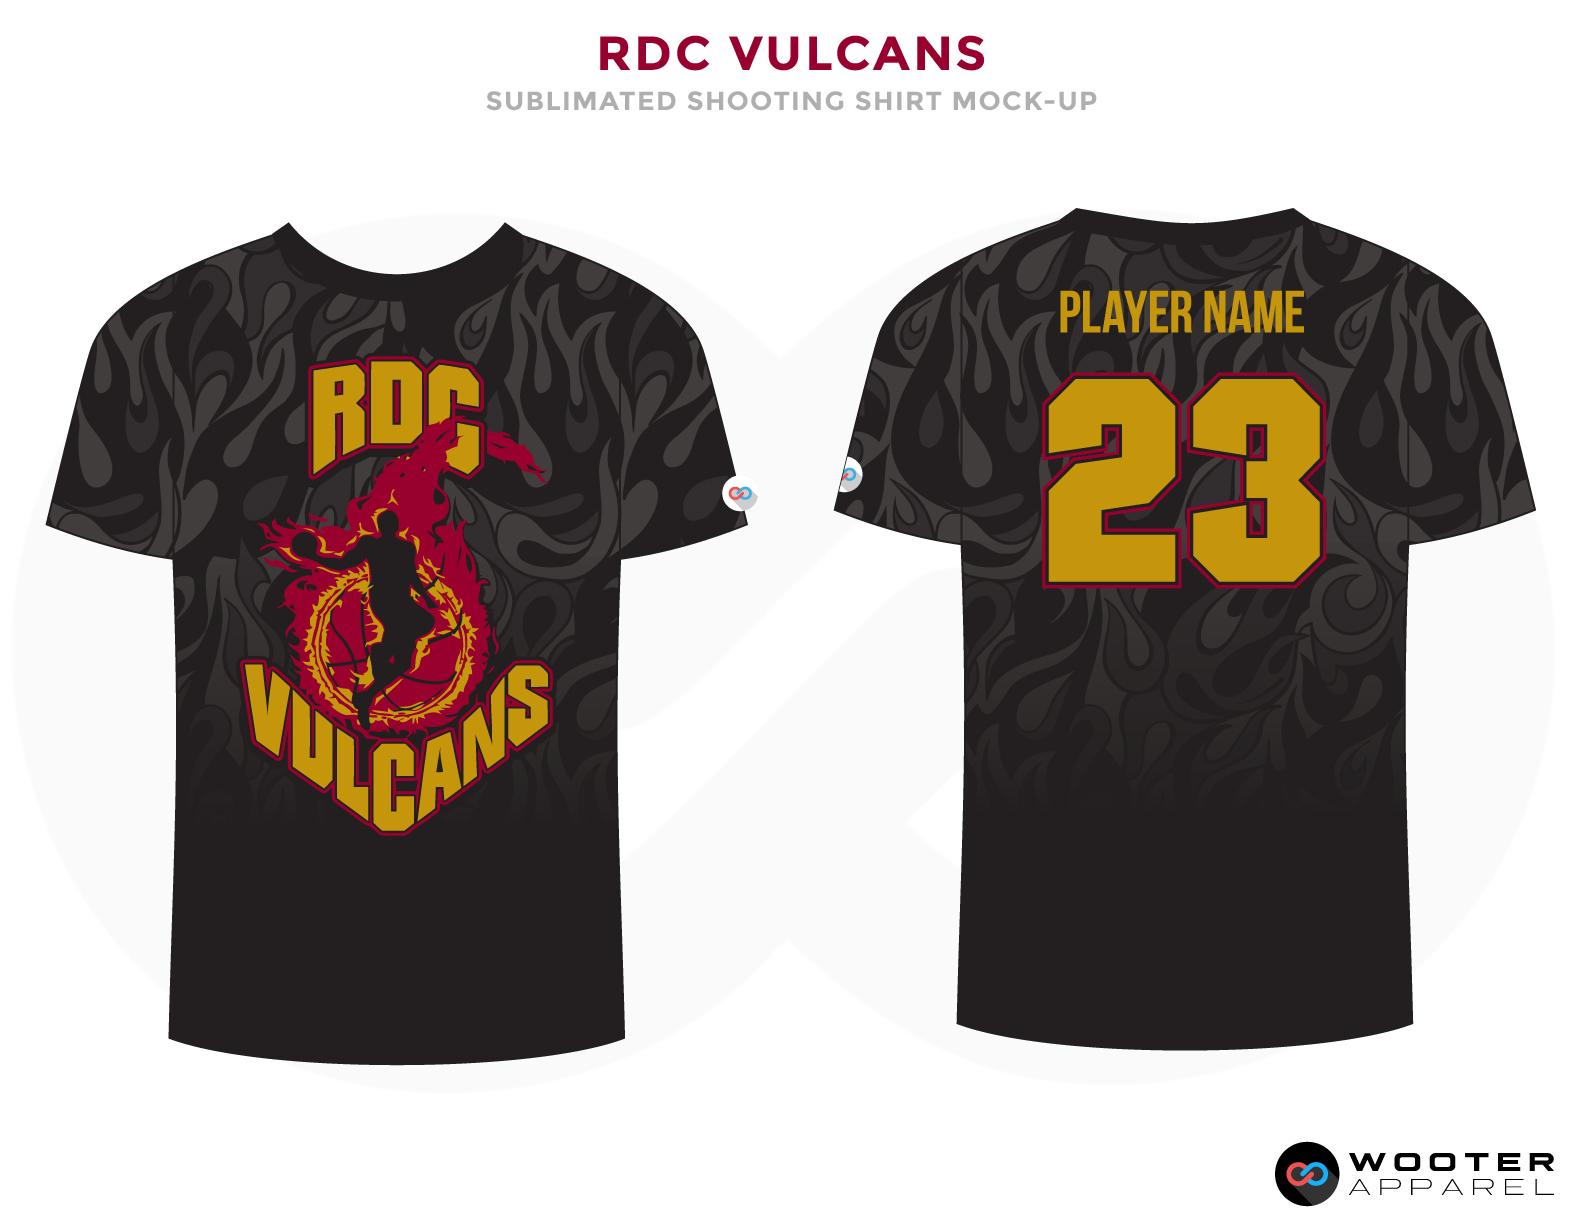 RDC VULCANS Black Golden Grey and Maroon Premium Shooting Shirt